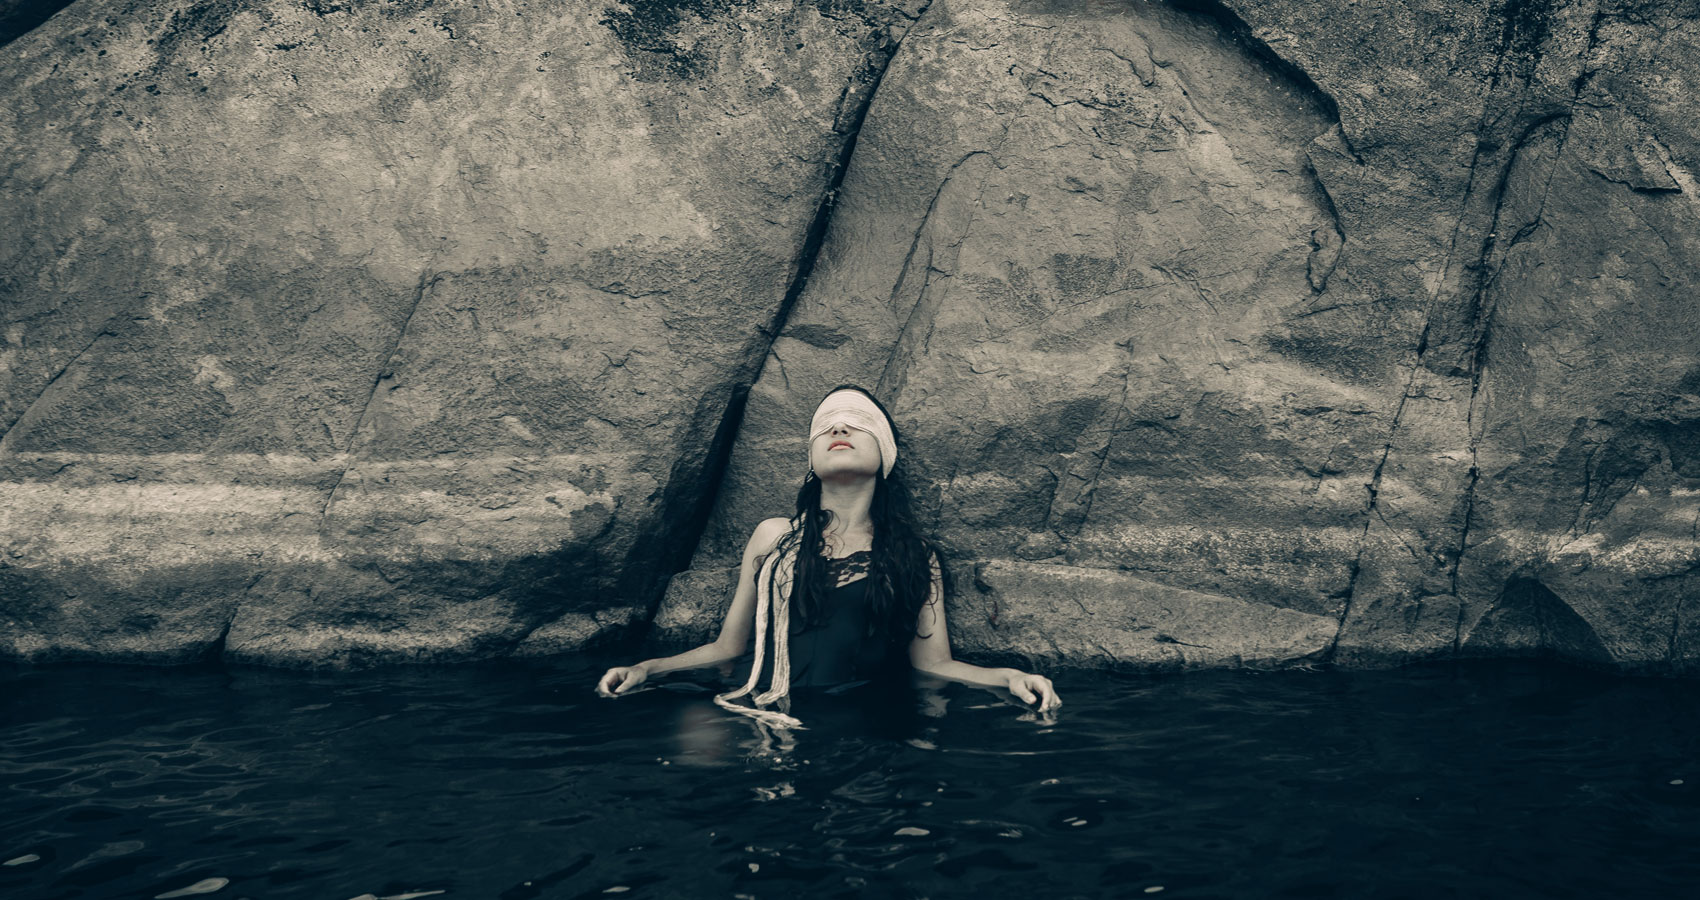 Infinitude Of Arcane Souls by Fallen Engel at Spillwords.com